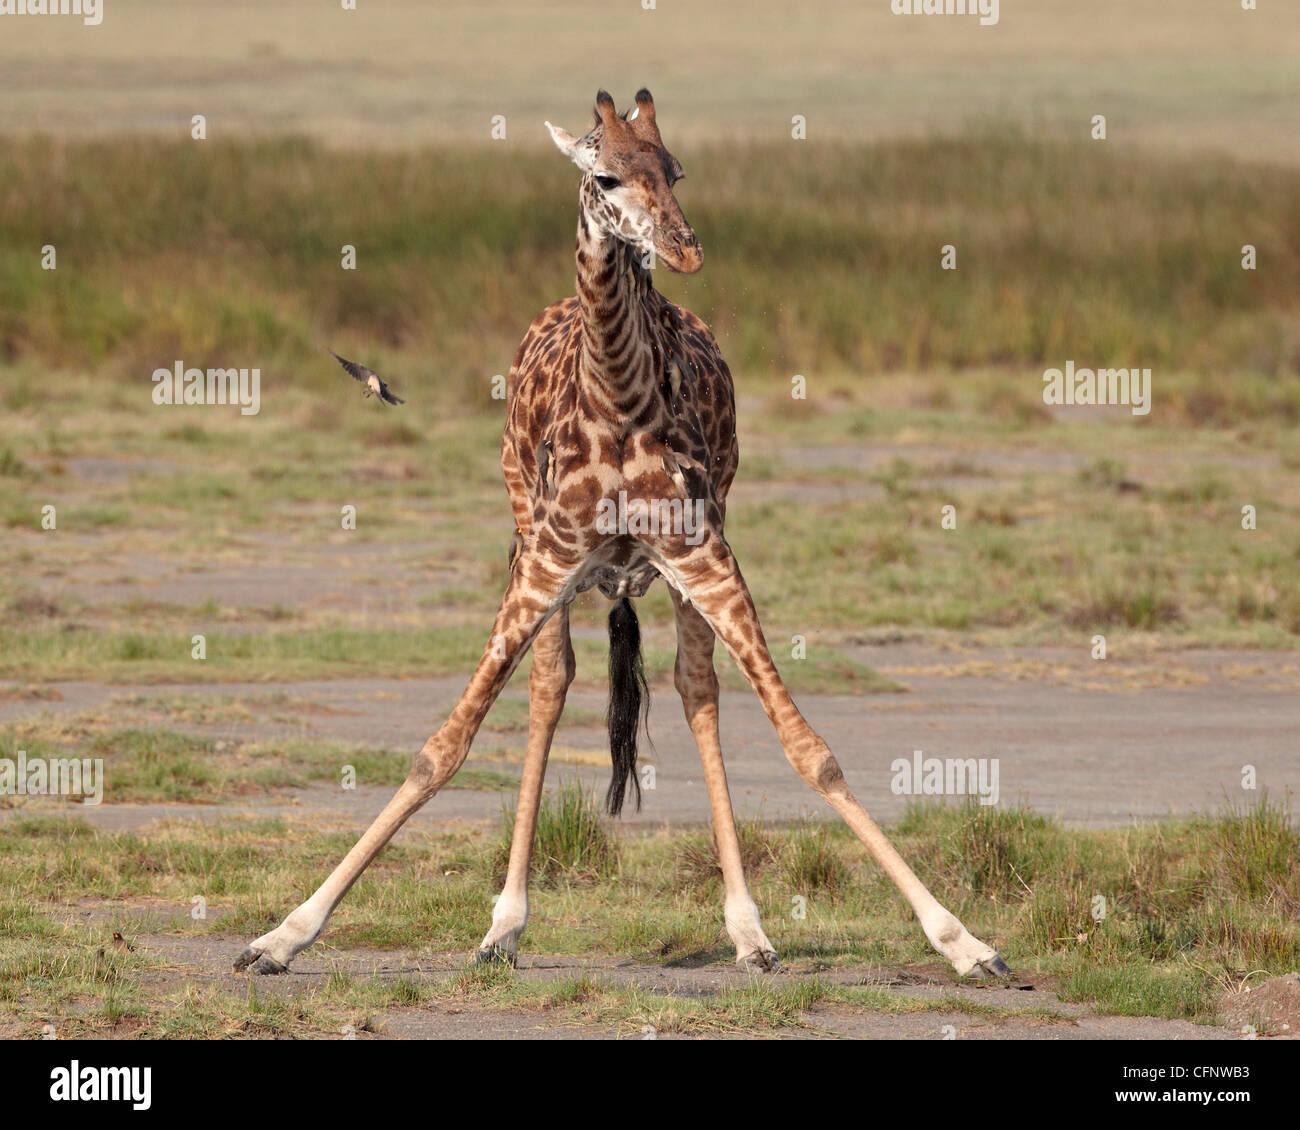 Masai giraffe (Giraffa camelopardalis tippelskirchi) bere, Serengeti National Park, Tanzania, Africa orientale, Immagini Stock